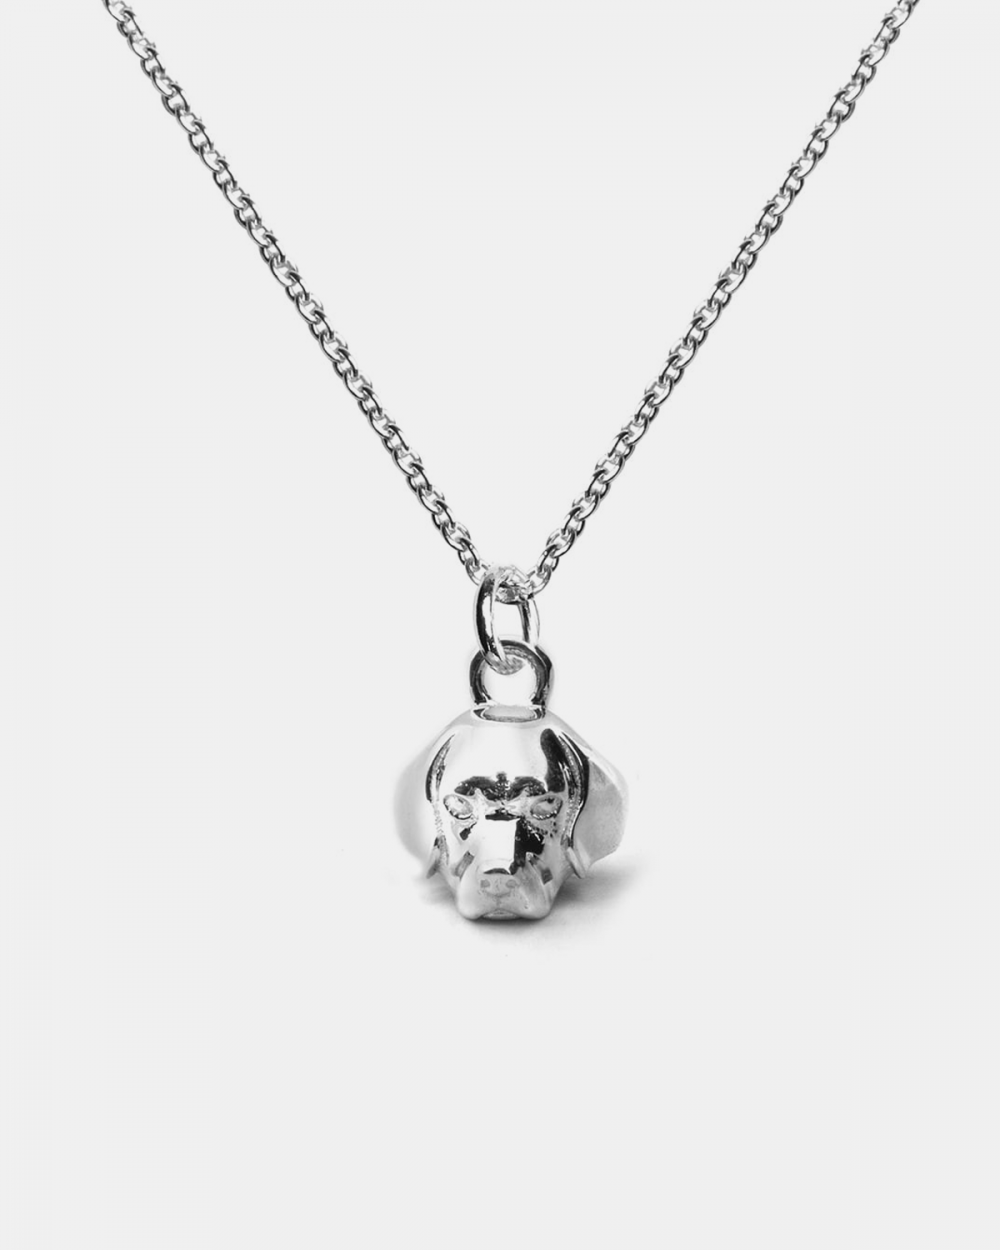 Necklaces BEAGLE PENDANT NECKLACE F040 L60 / POLISHED SILVER NOVE25